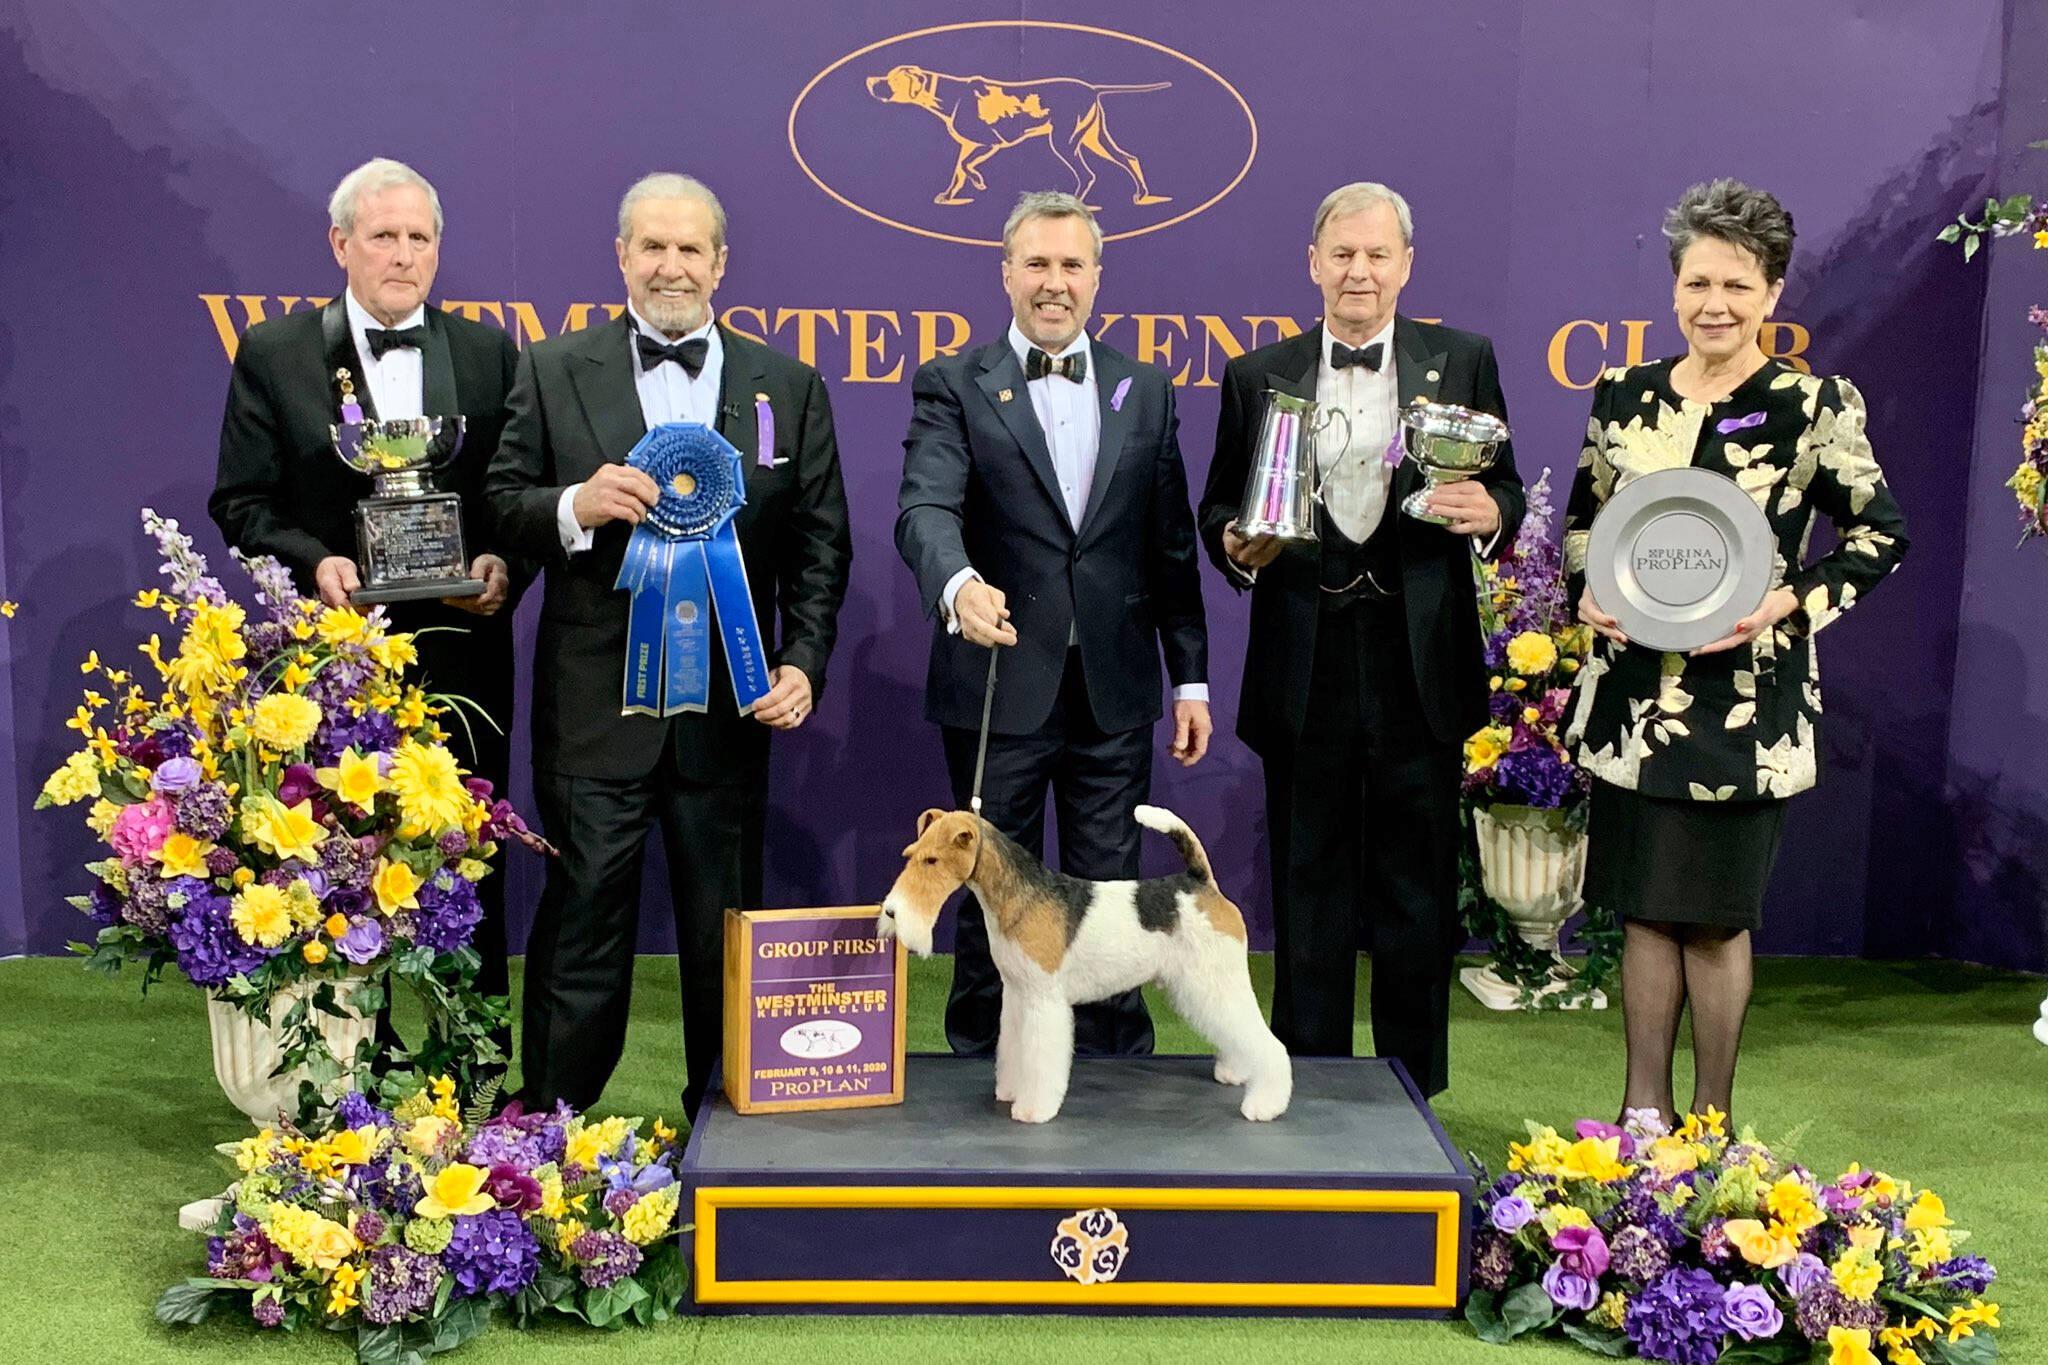 westminster dog show sportsnet